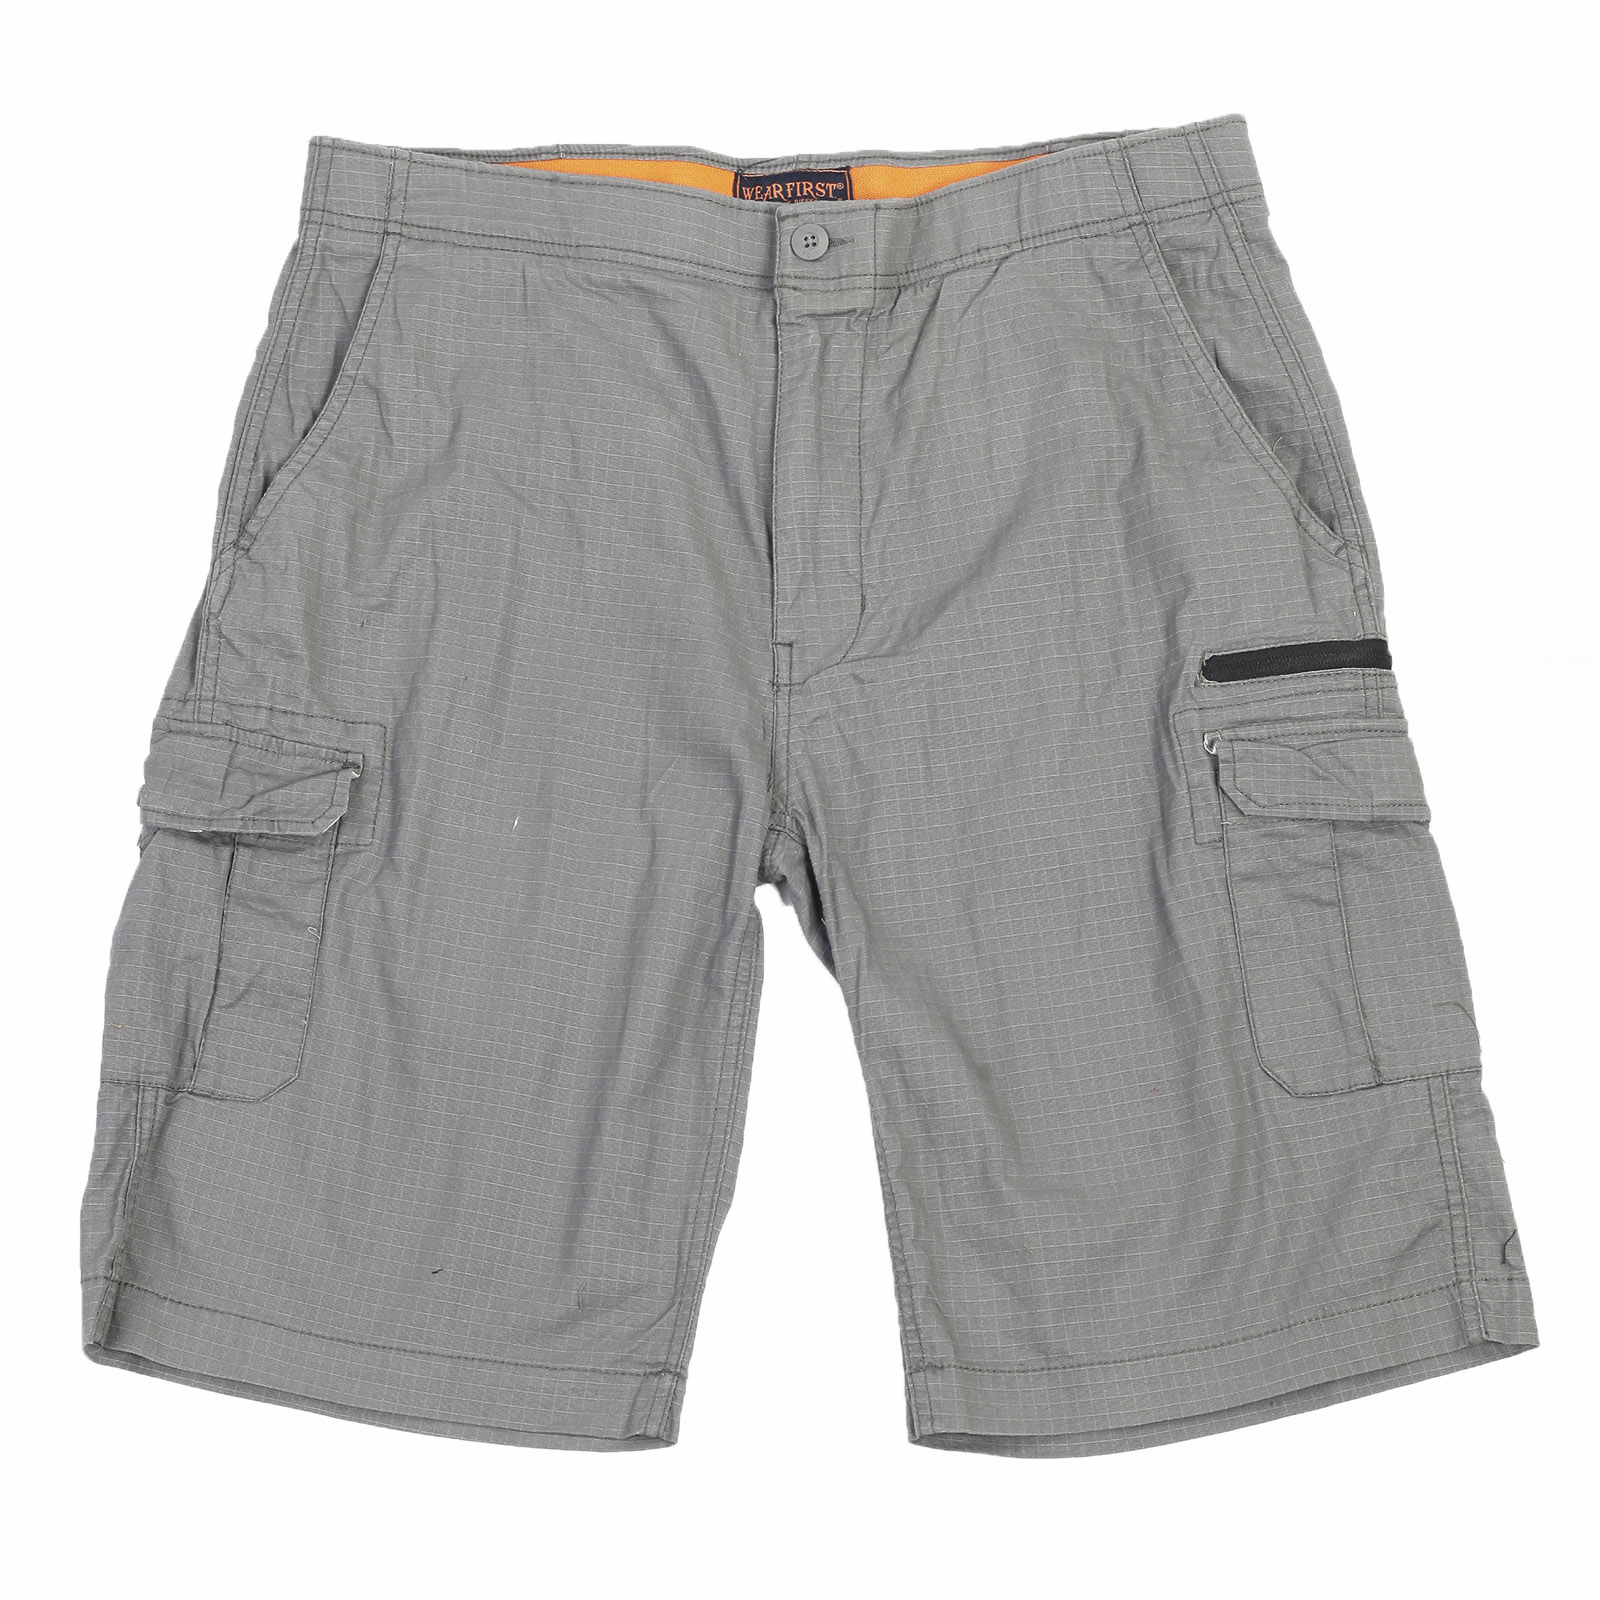 Летние мужские шорты Wear First с боковыми карманами.